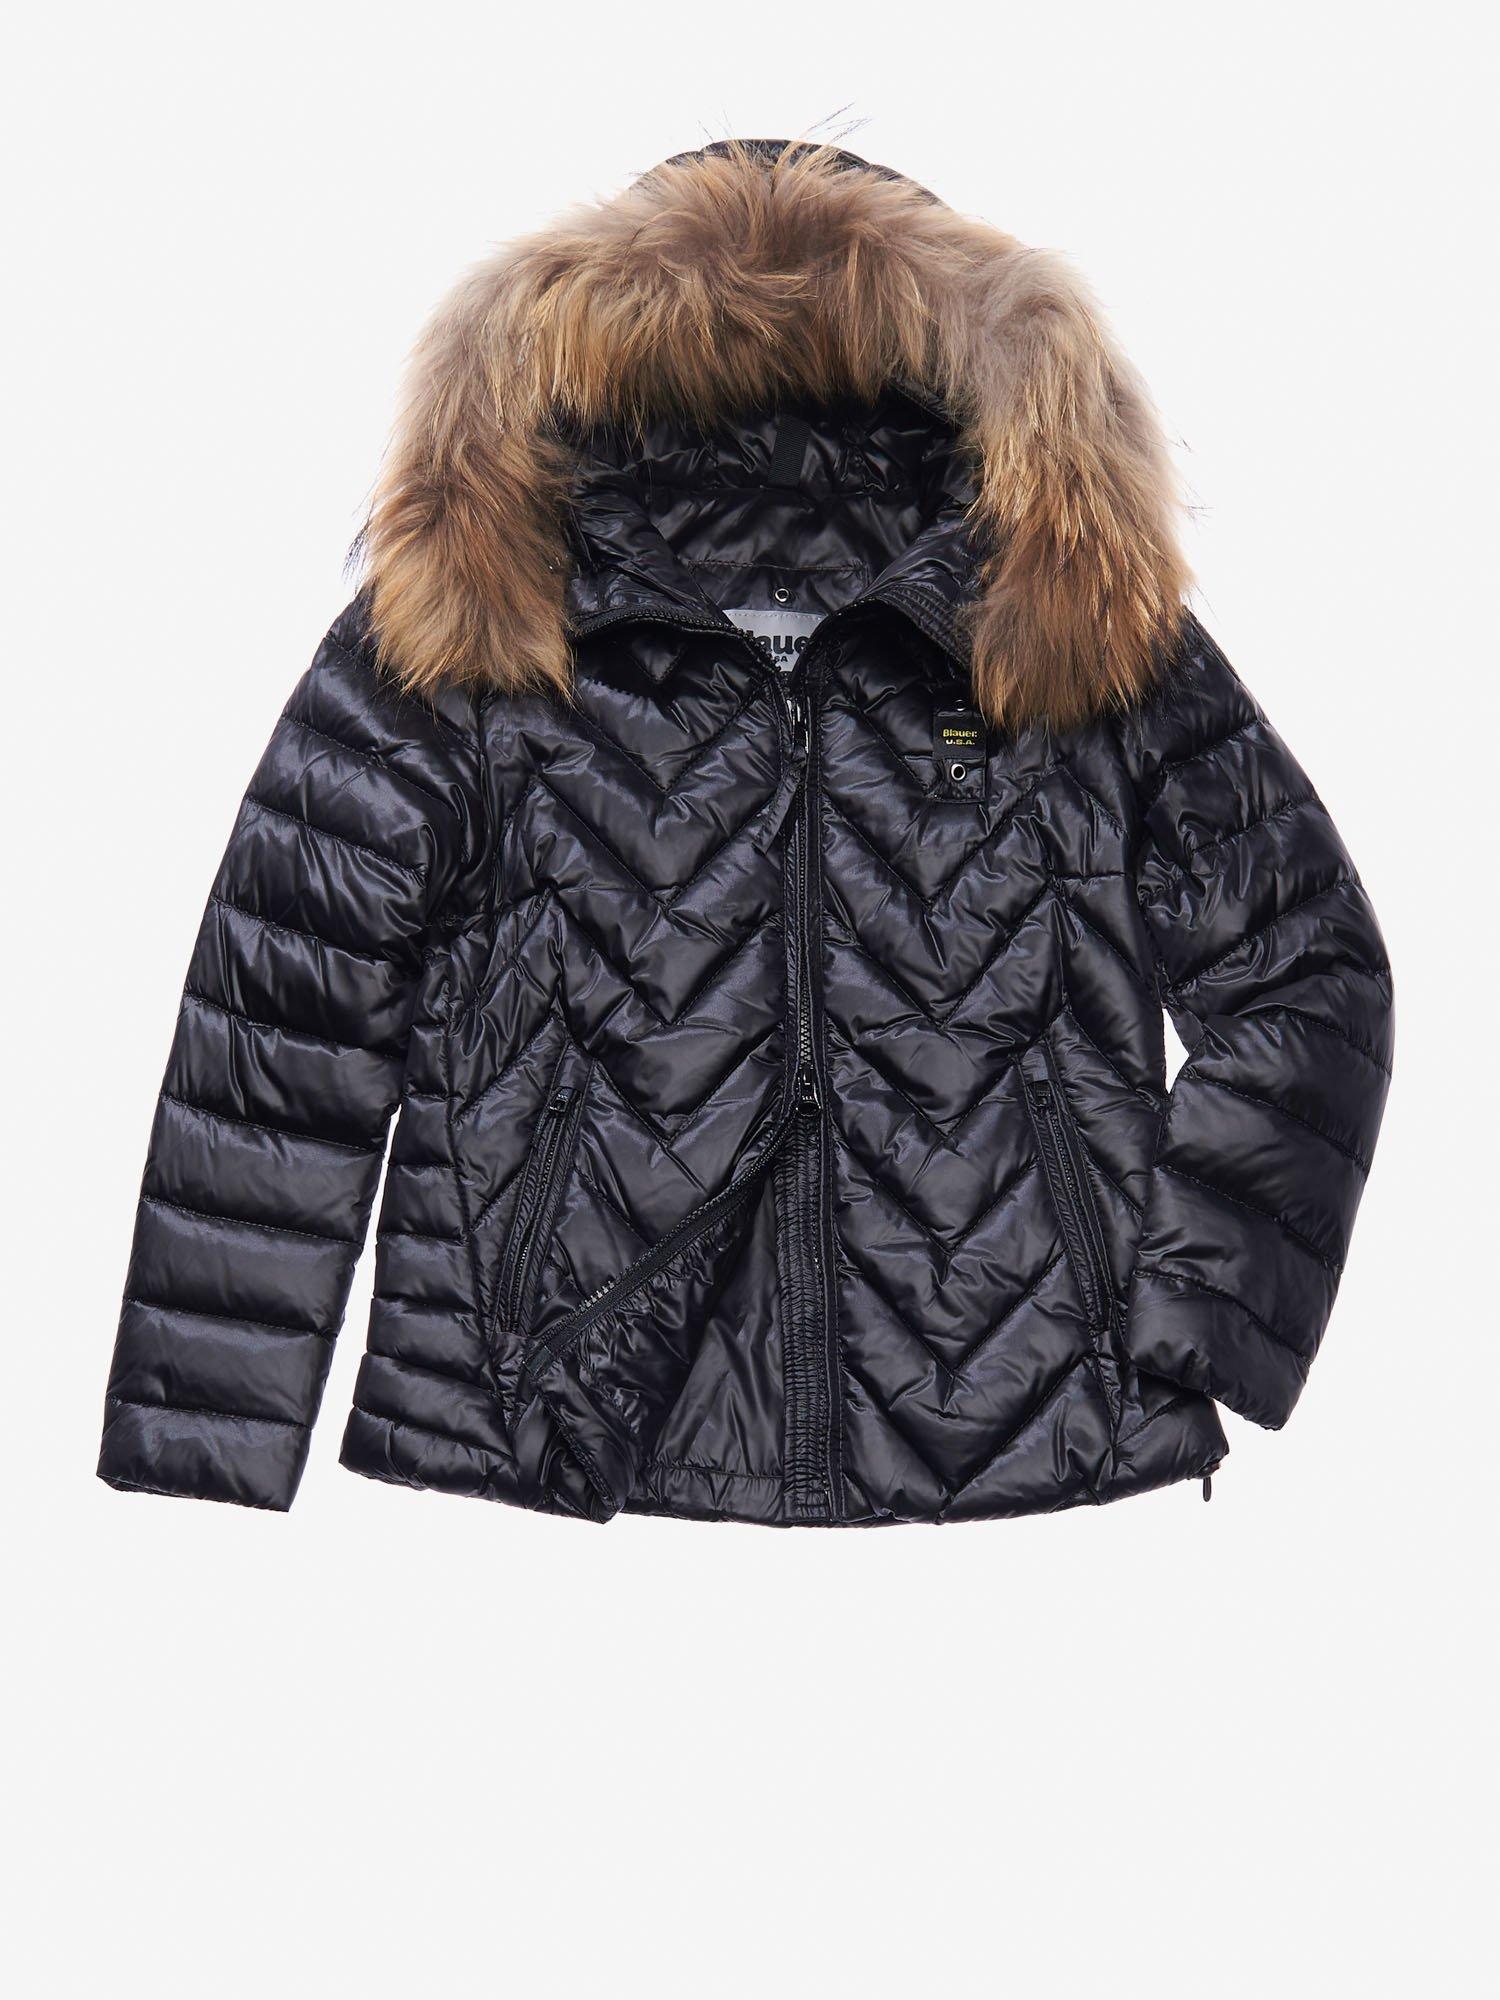 d540b6147a74 Giubbotti e abbigliamento Bambina Blauer ® - Shop Online